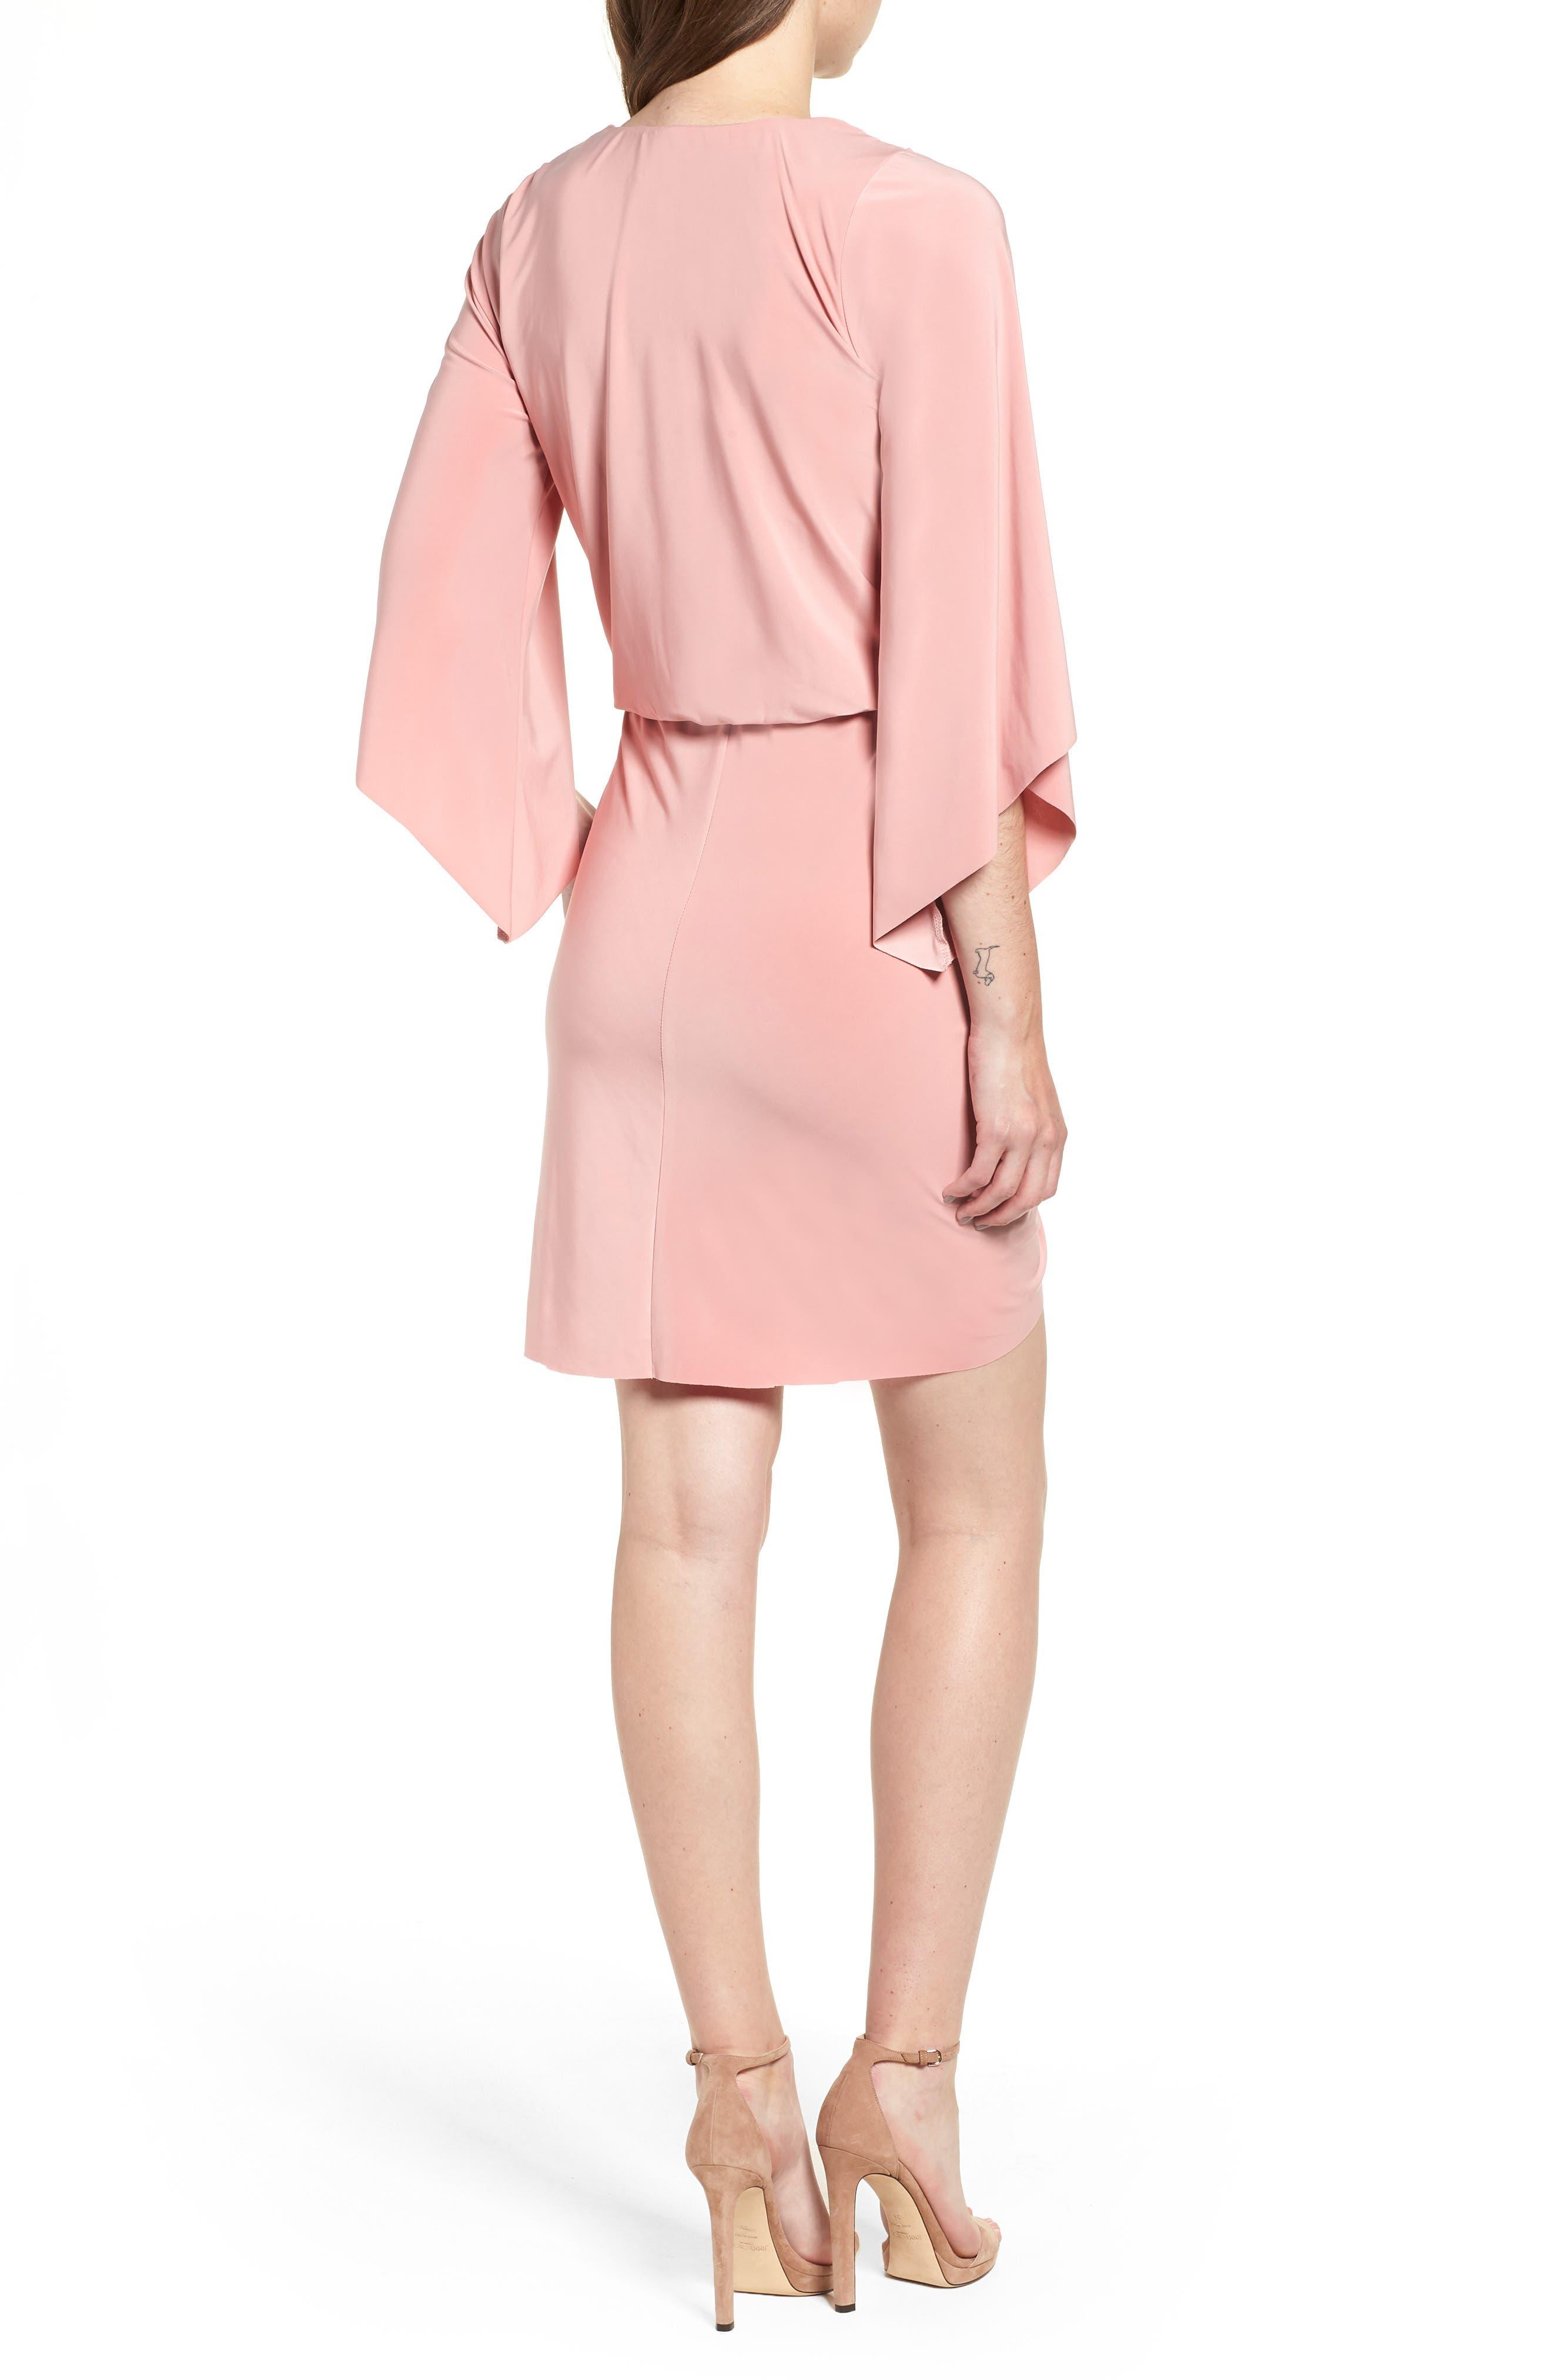 Teget Knot Front Dress,                             Alternate thumbnail 2, color,                             DUSTY ROSE